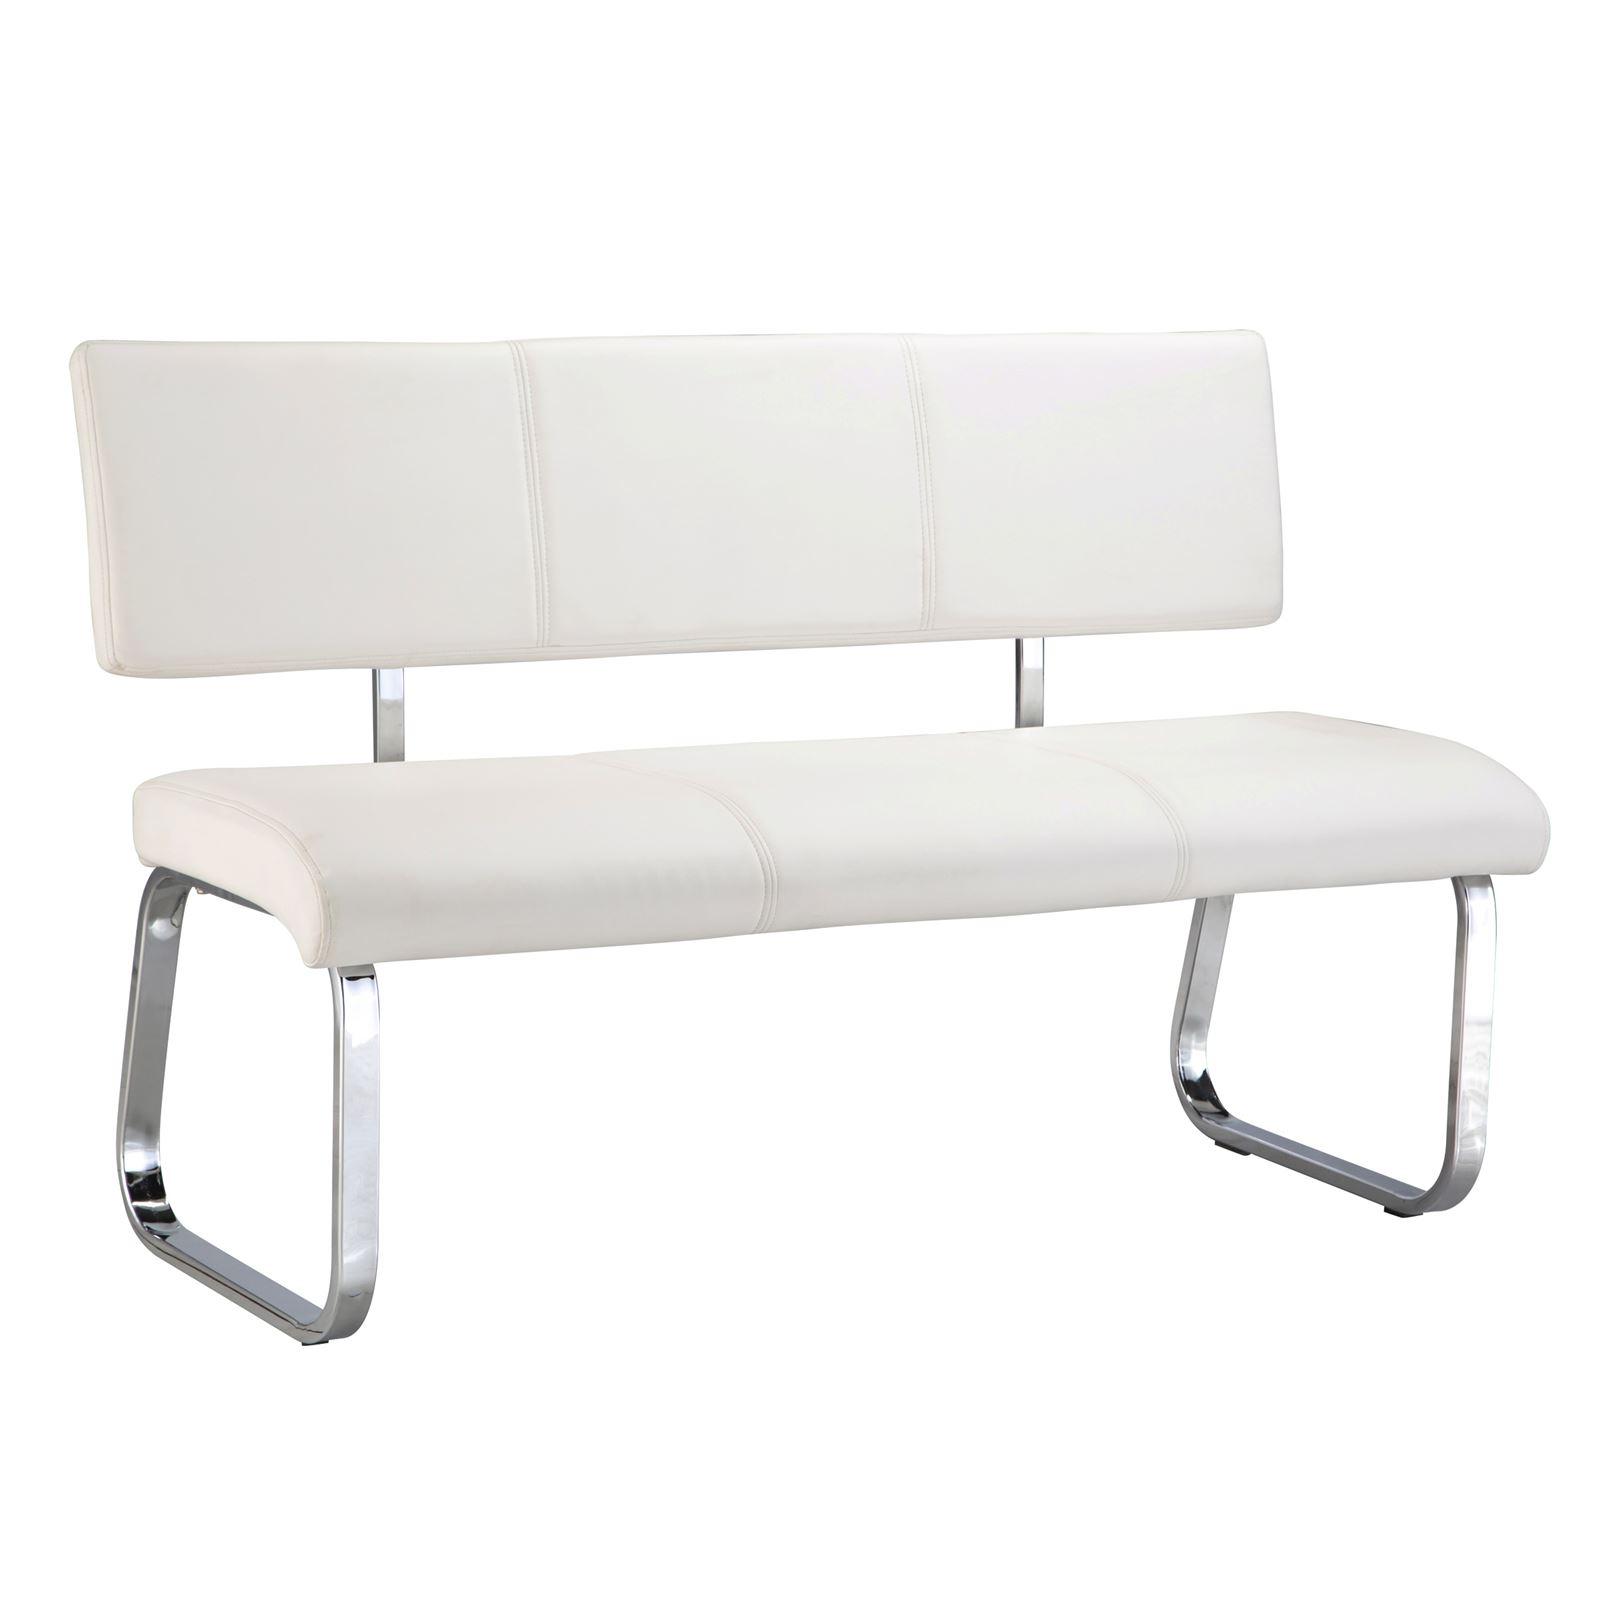 esszimmerbank essbank vilas wei mobilia24. Black Bedroom Furniture Sets. Home Design Ideas